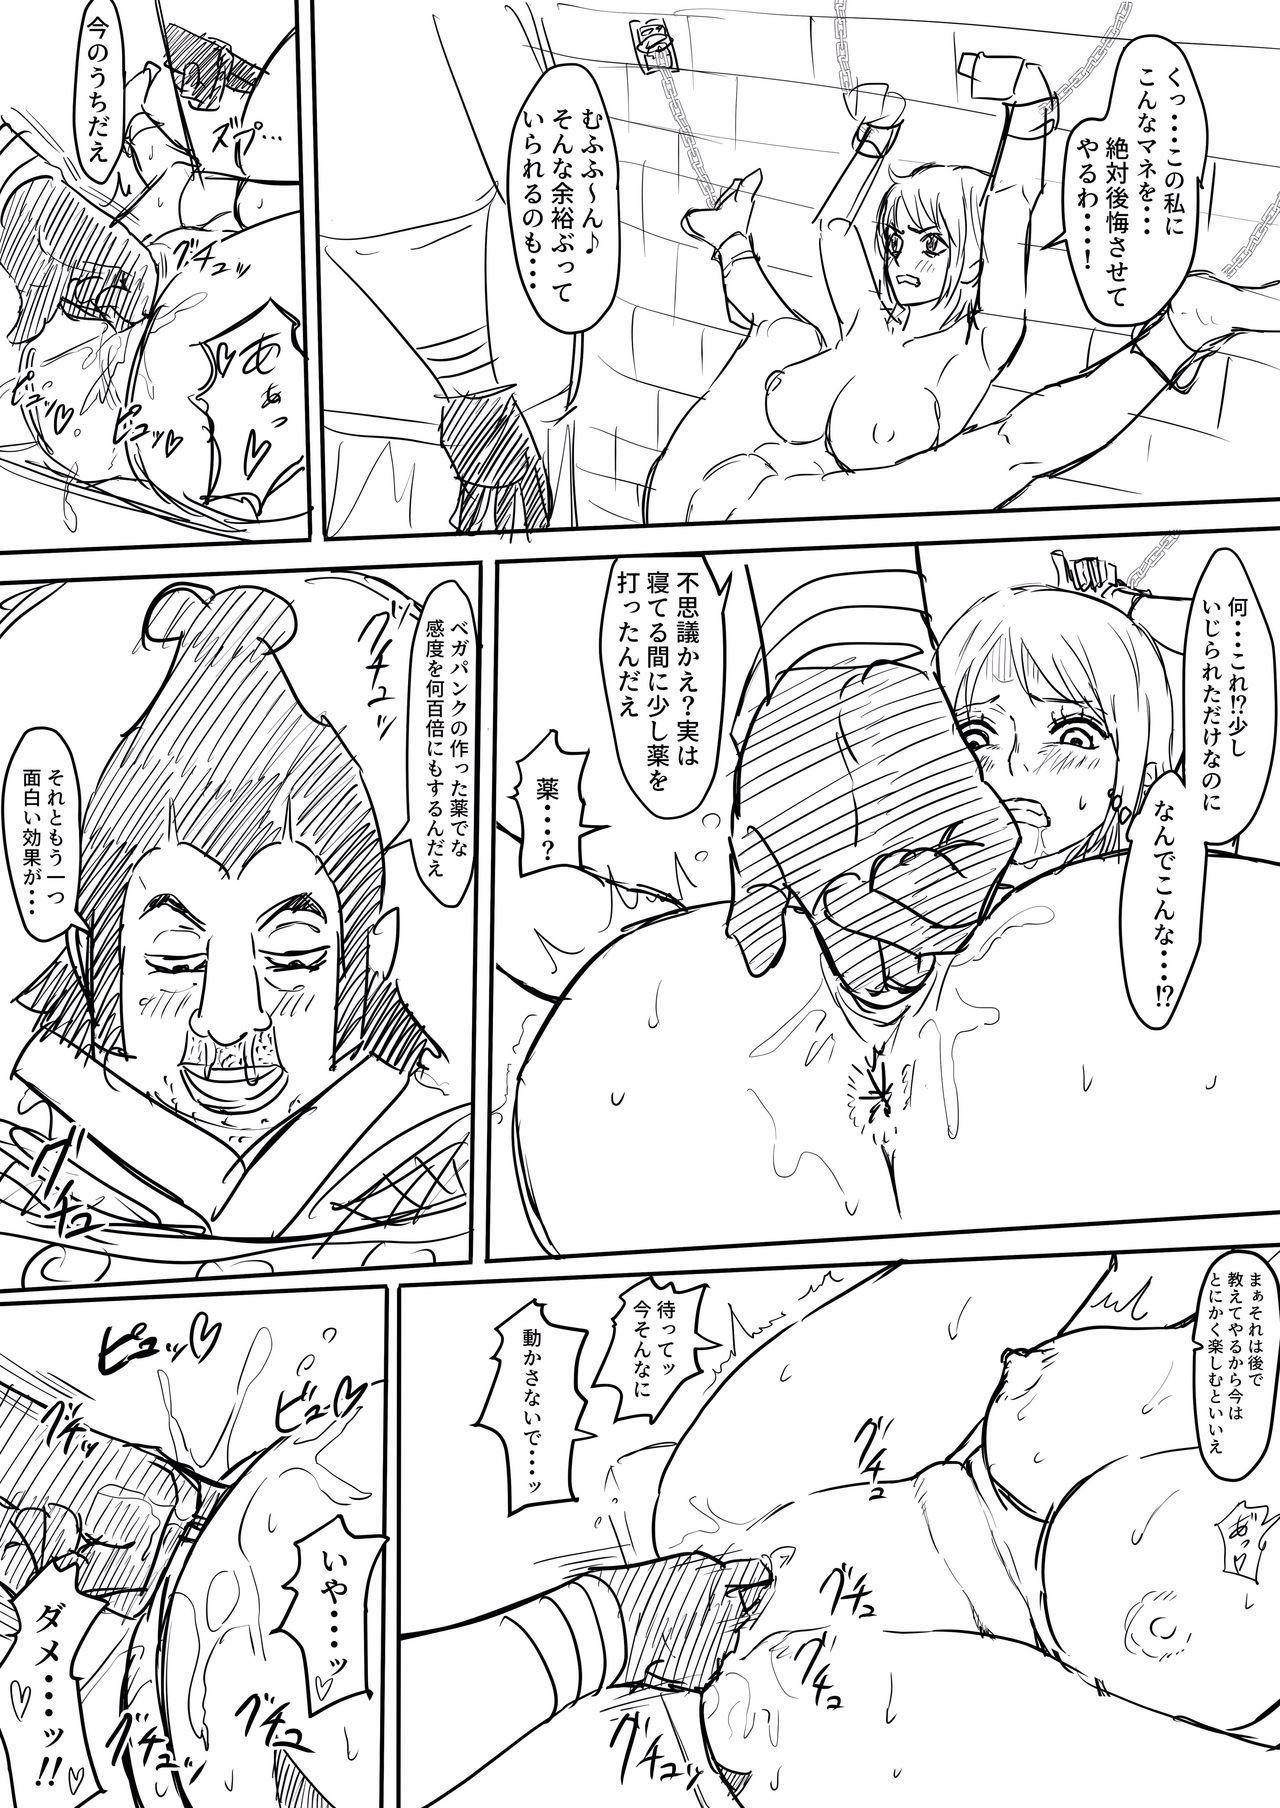 [Iwao] Nami H Manga (One Piece) Updated 7